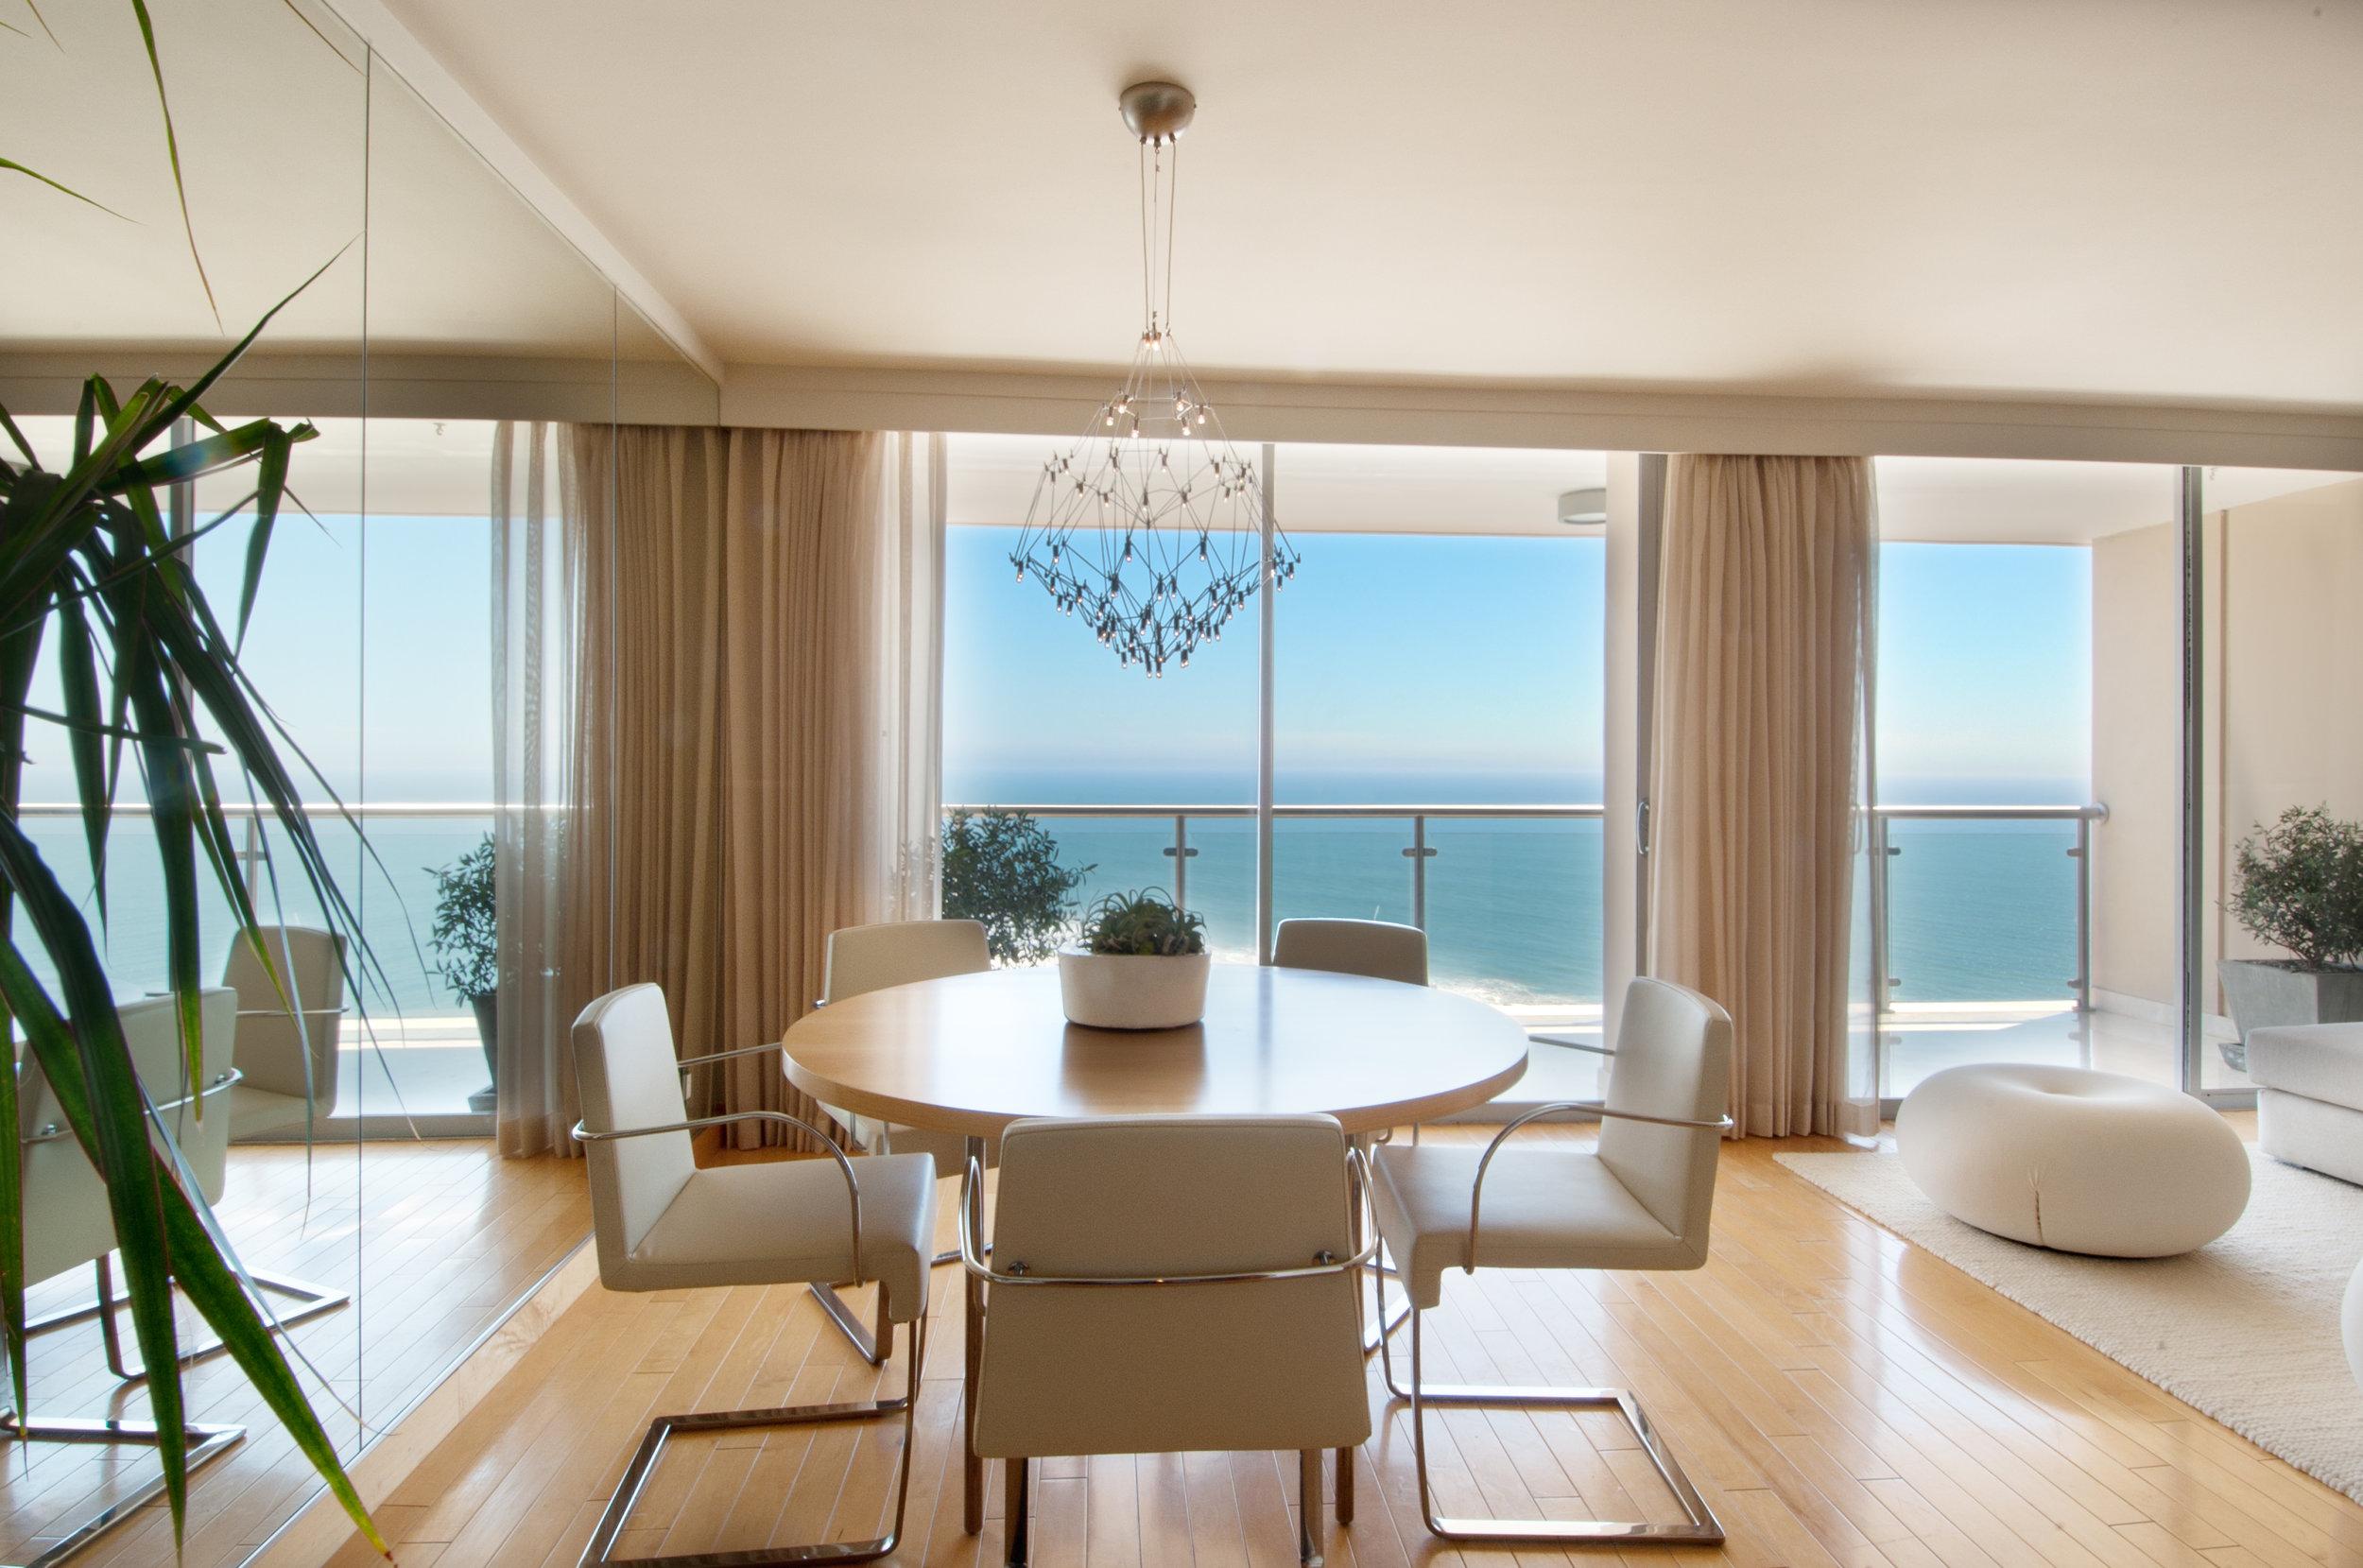 Sarah-barnard-design-modern-luxury-ocean-view-diningroom.jpg